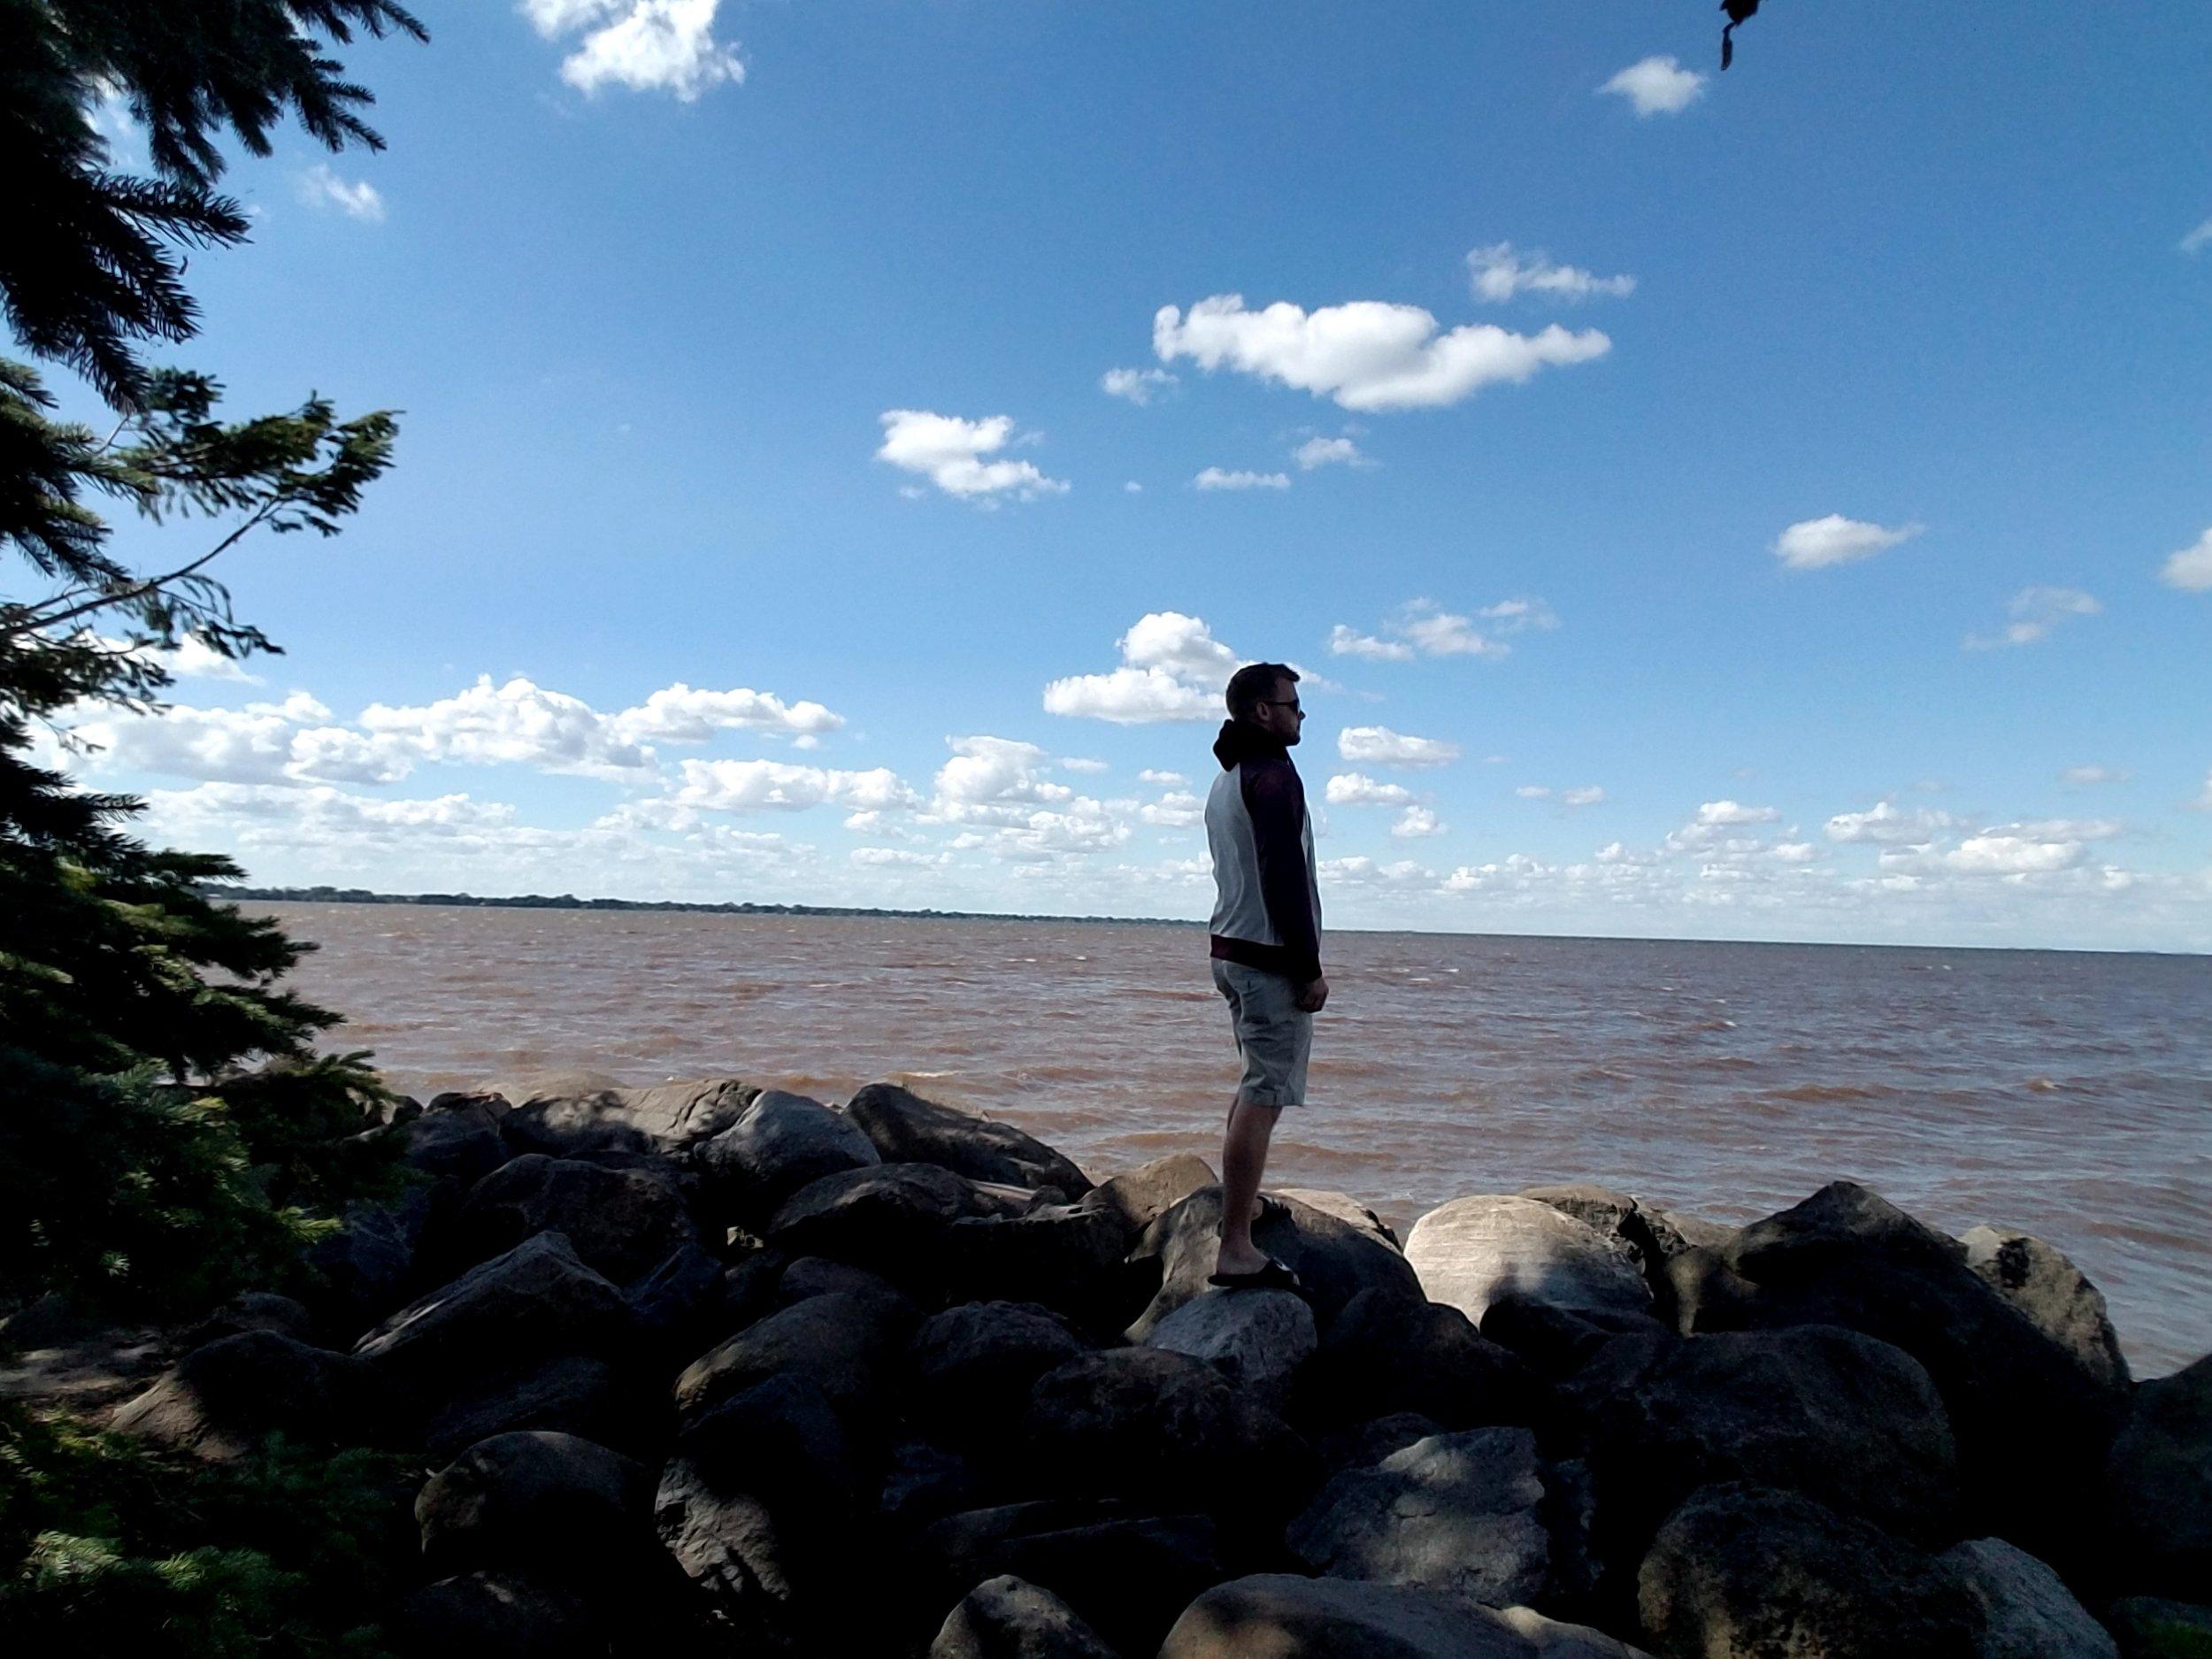 Lake Winnebago, Fond du Lac, Wisconsin